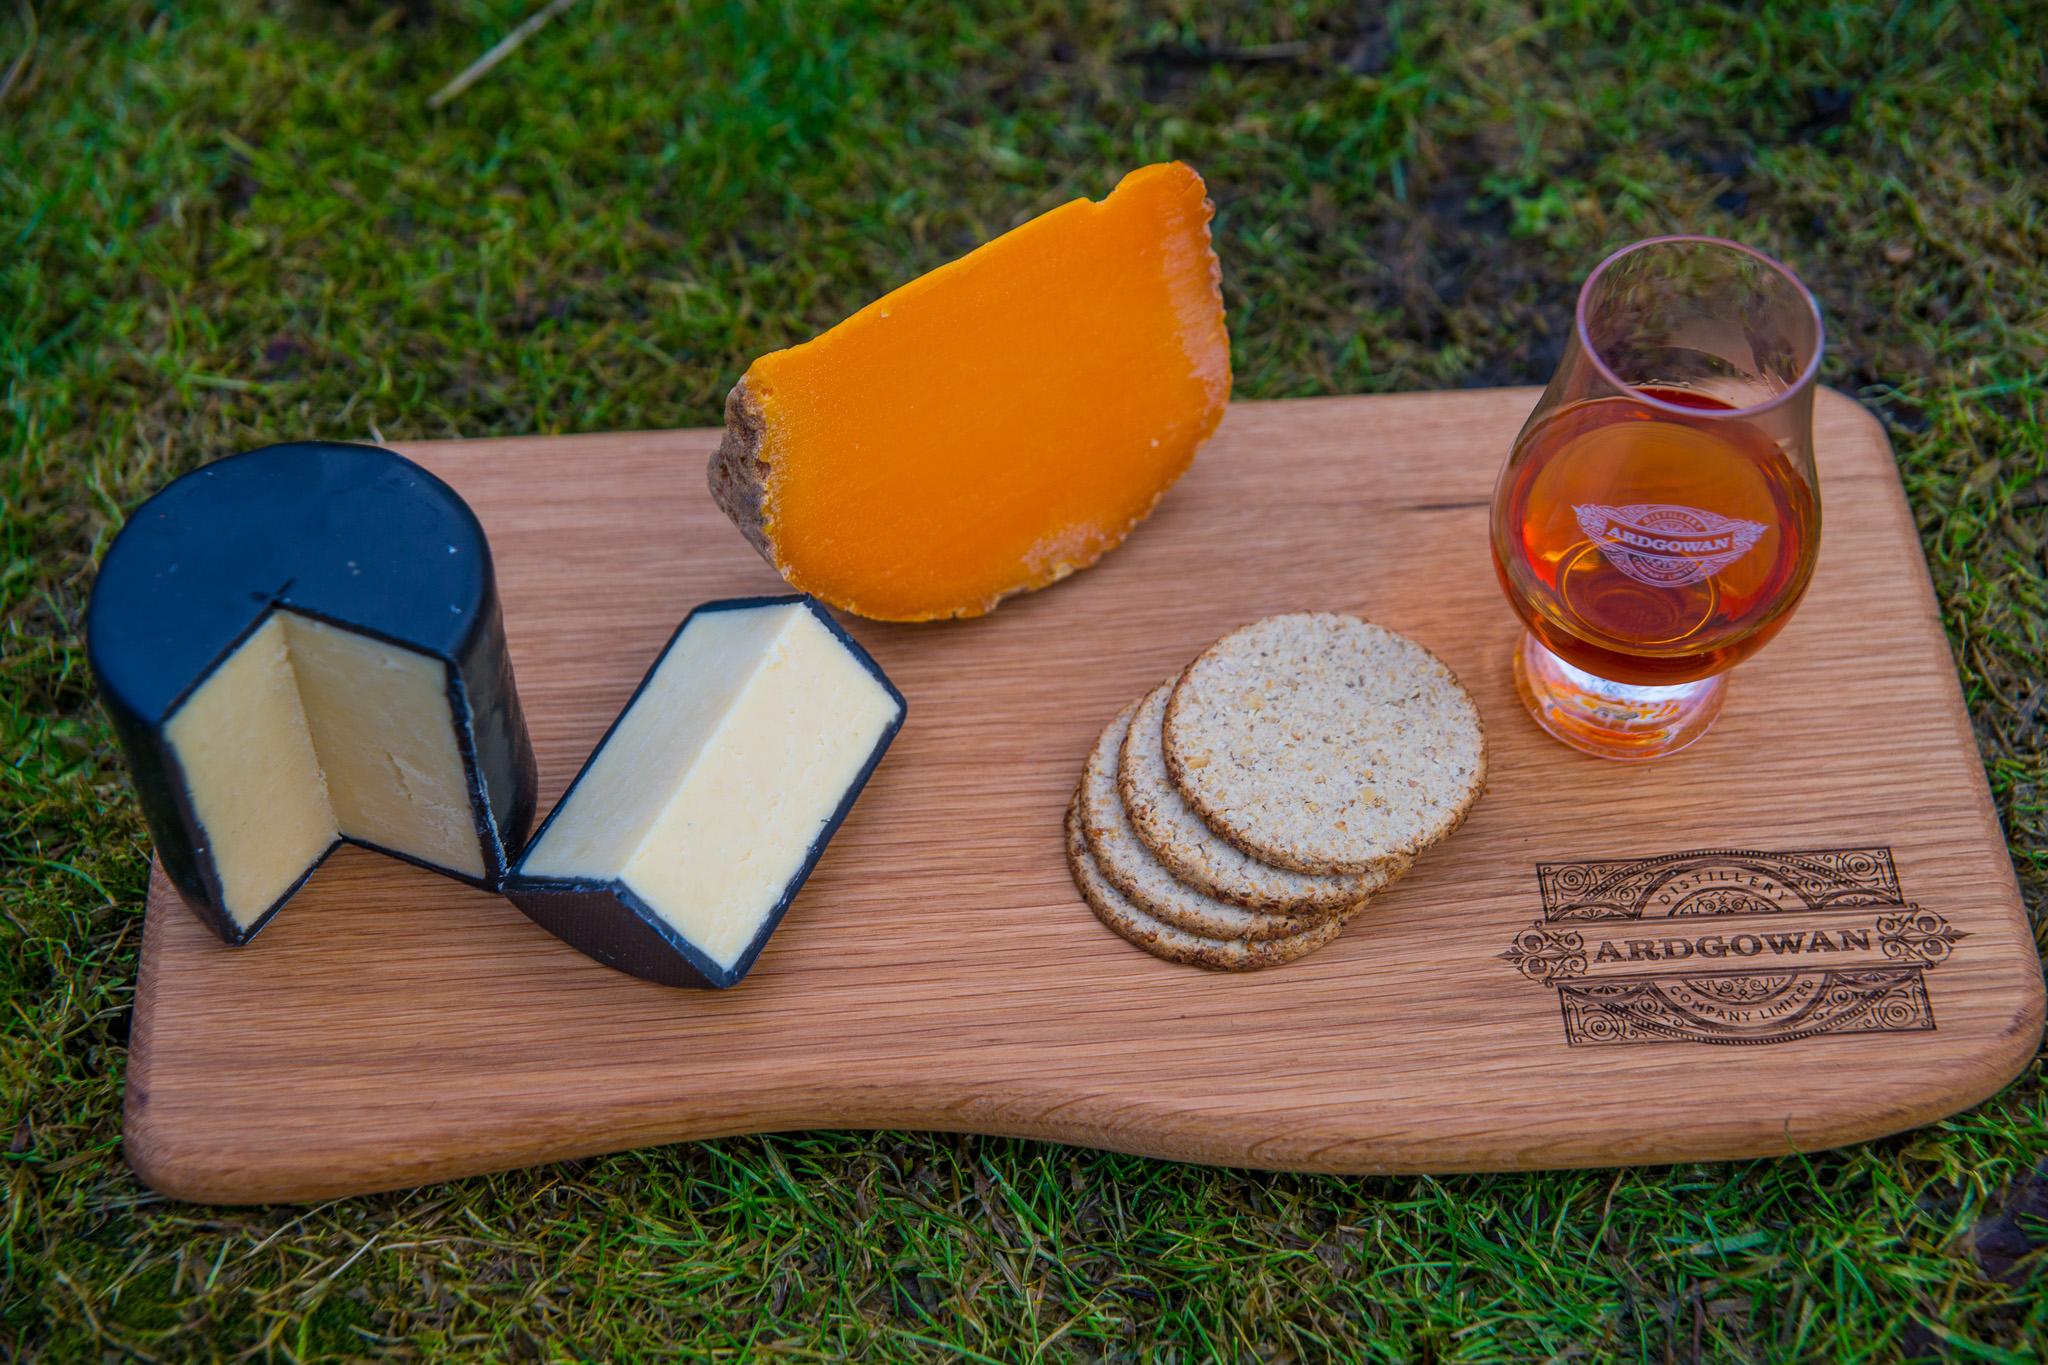 CheeseBoard-Outside1.jpg